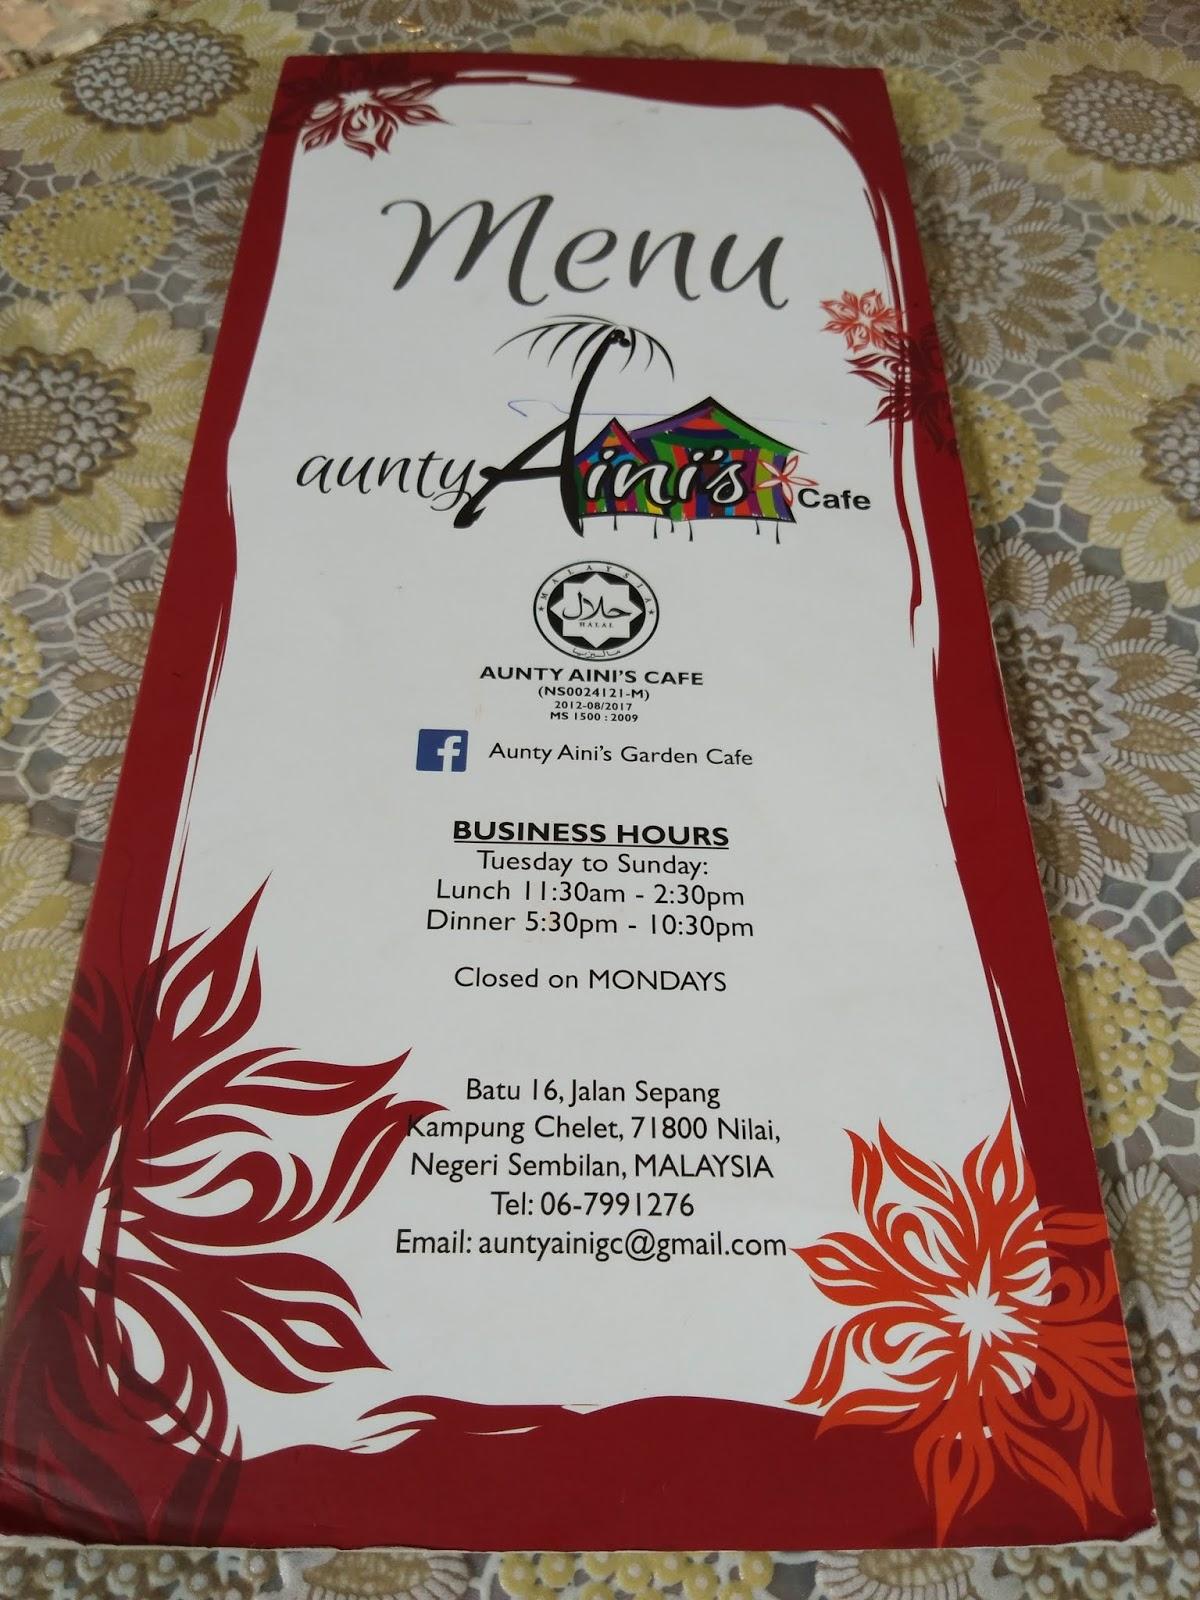 Salam Sharing My Travel Experience Aunty Aini S Garden Cafe